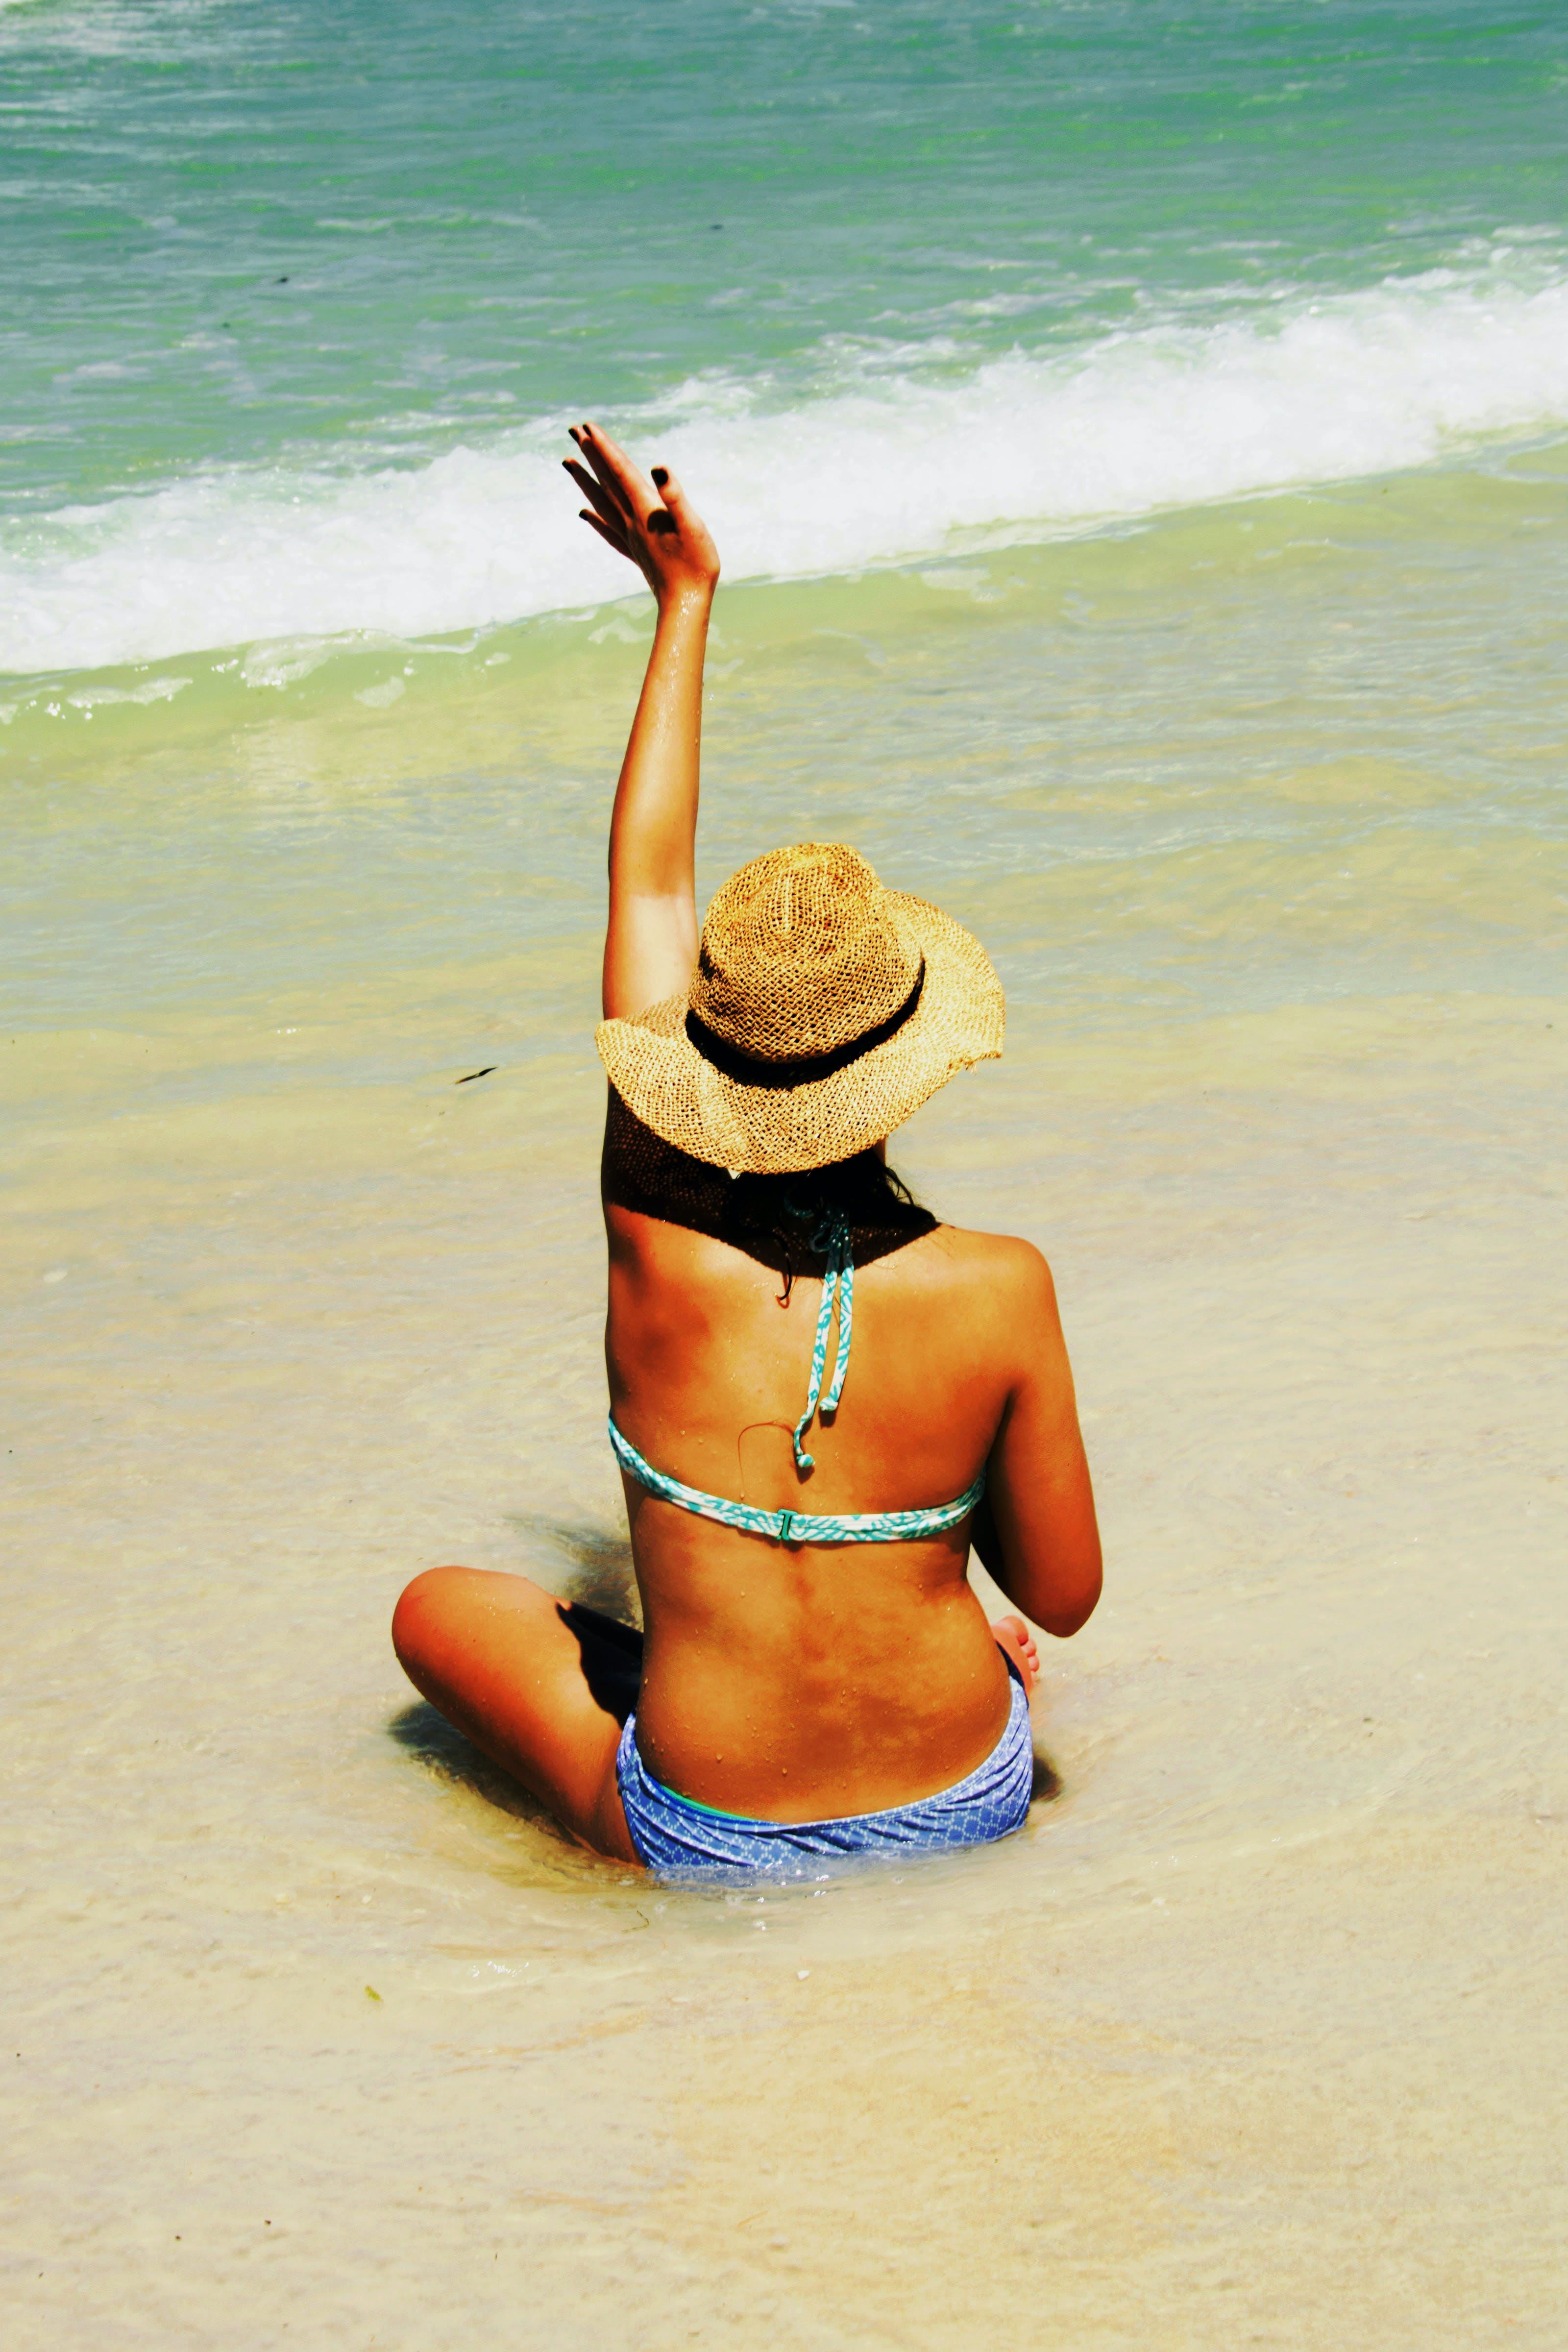 Kostnadsfri bild av avslappning, bikini, dagsljus, fritid